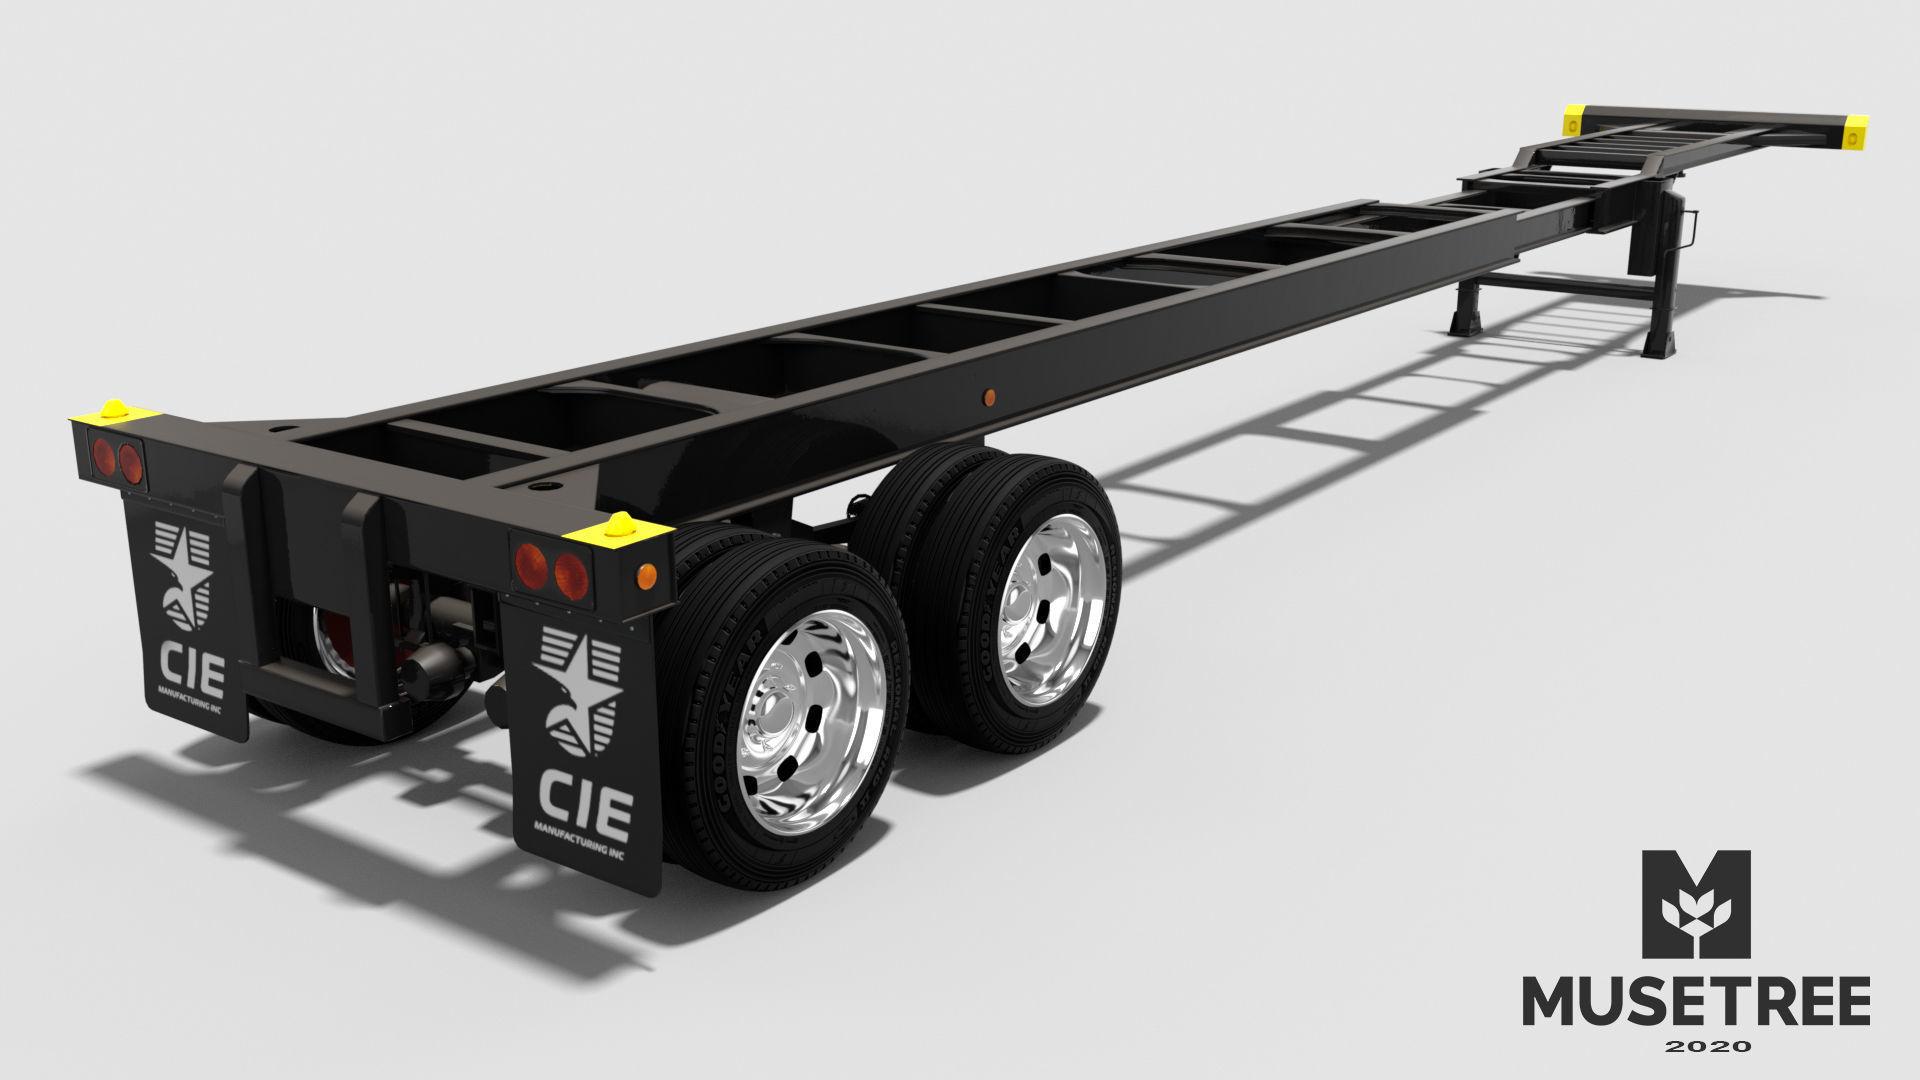 Extendable tandem trailer